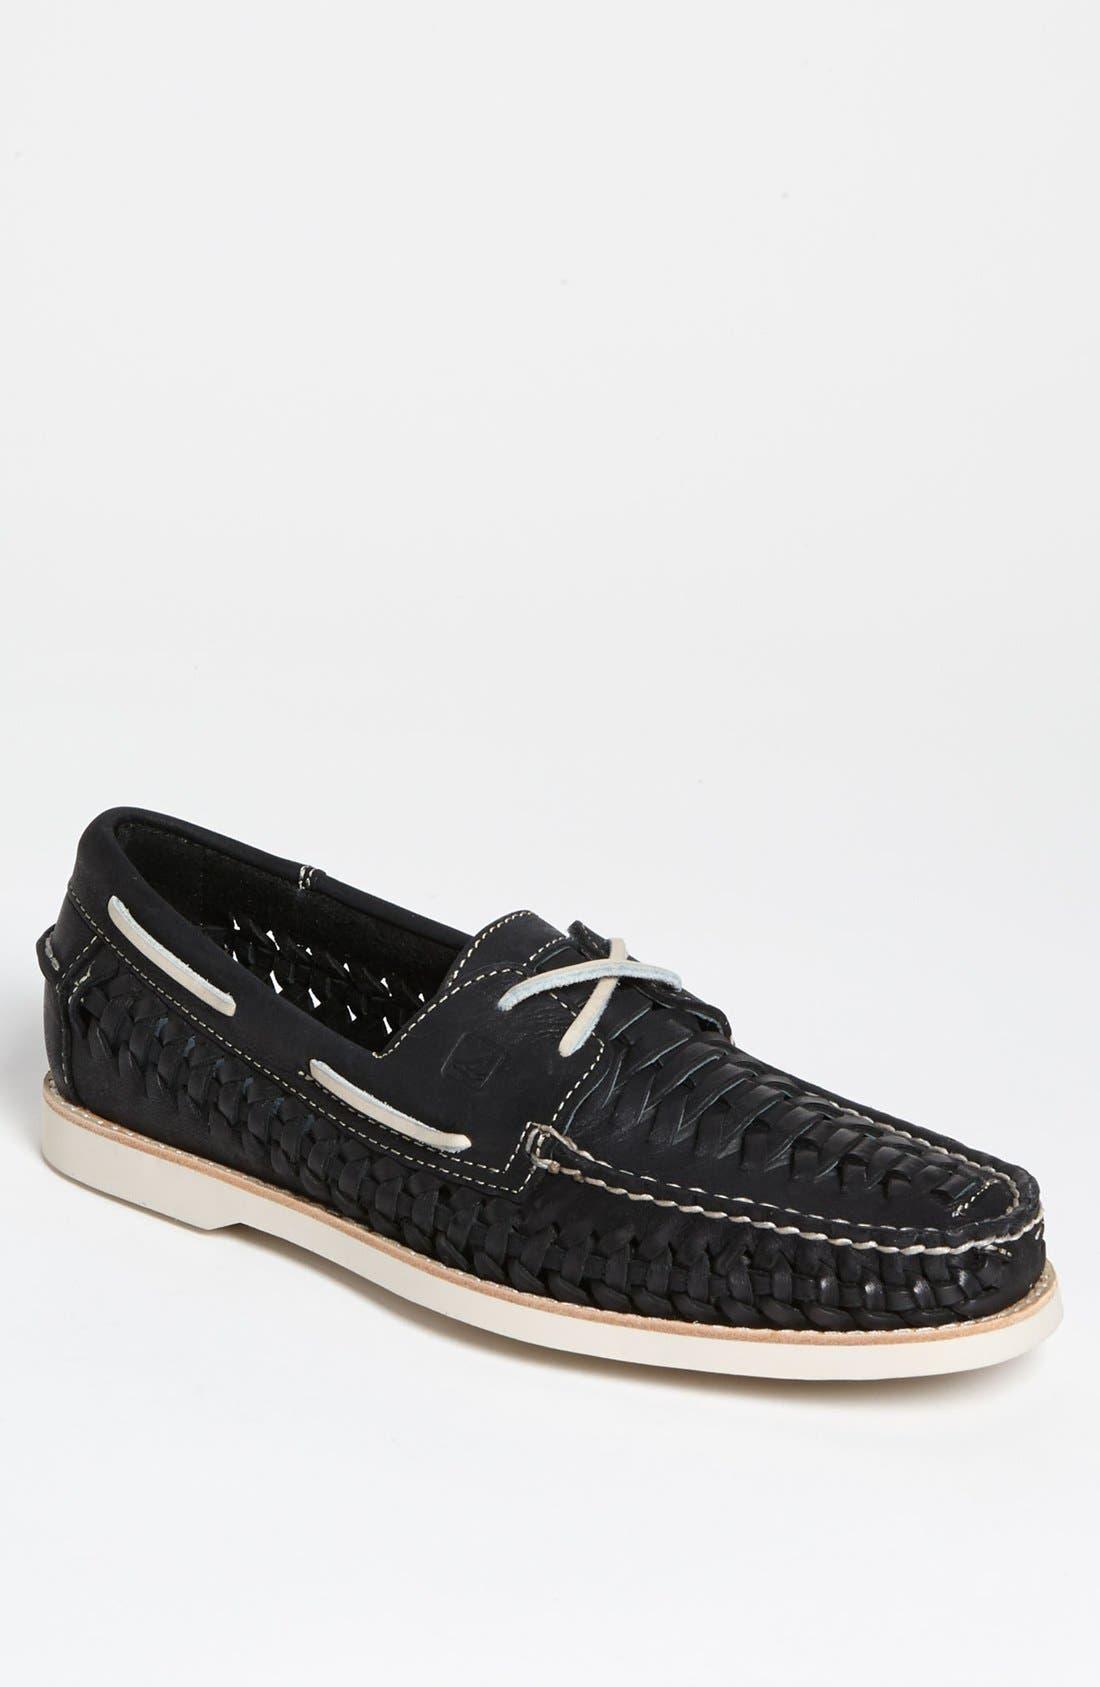 Alternate Image 1 Selected - Sperry Top-Sider® 'Seaside' Woven Boat Shoe (Men)